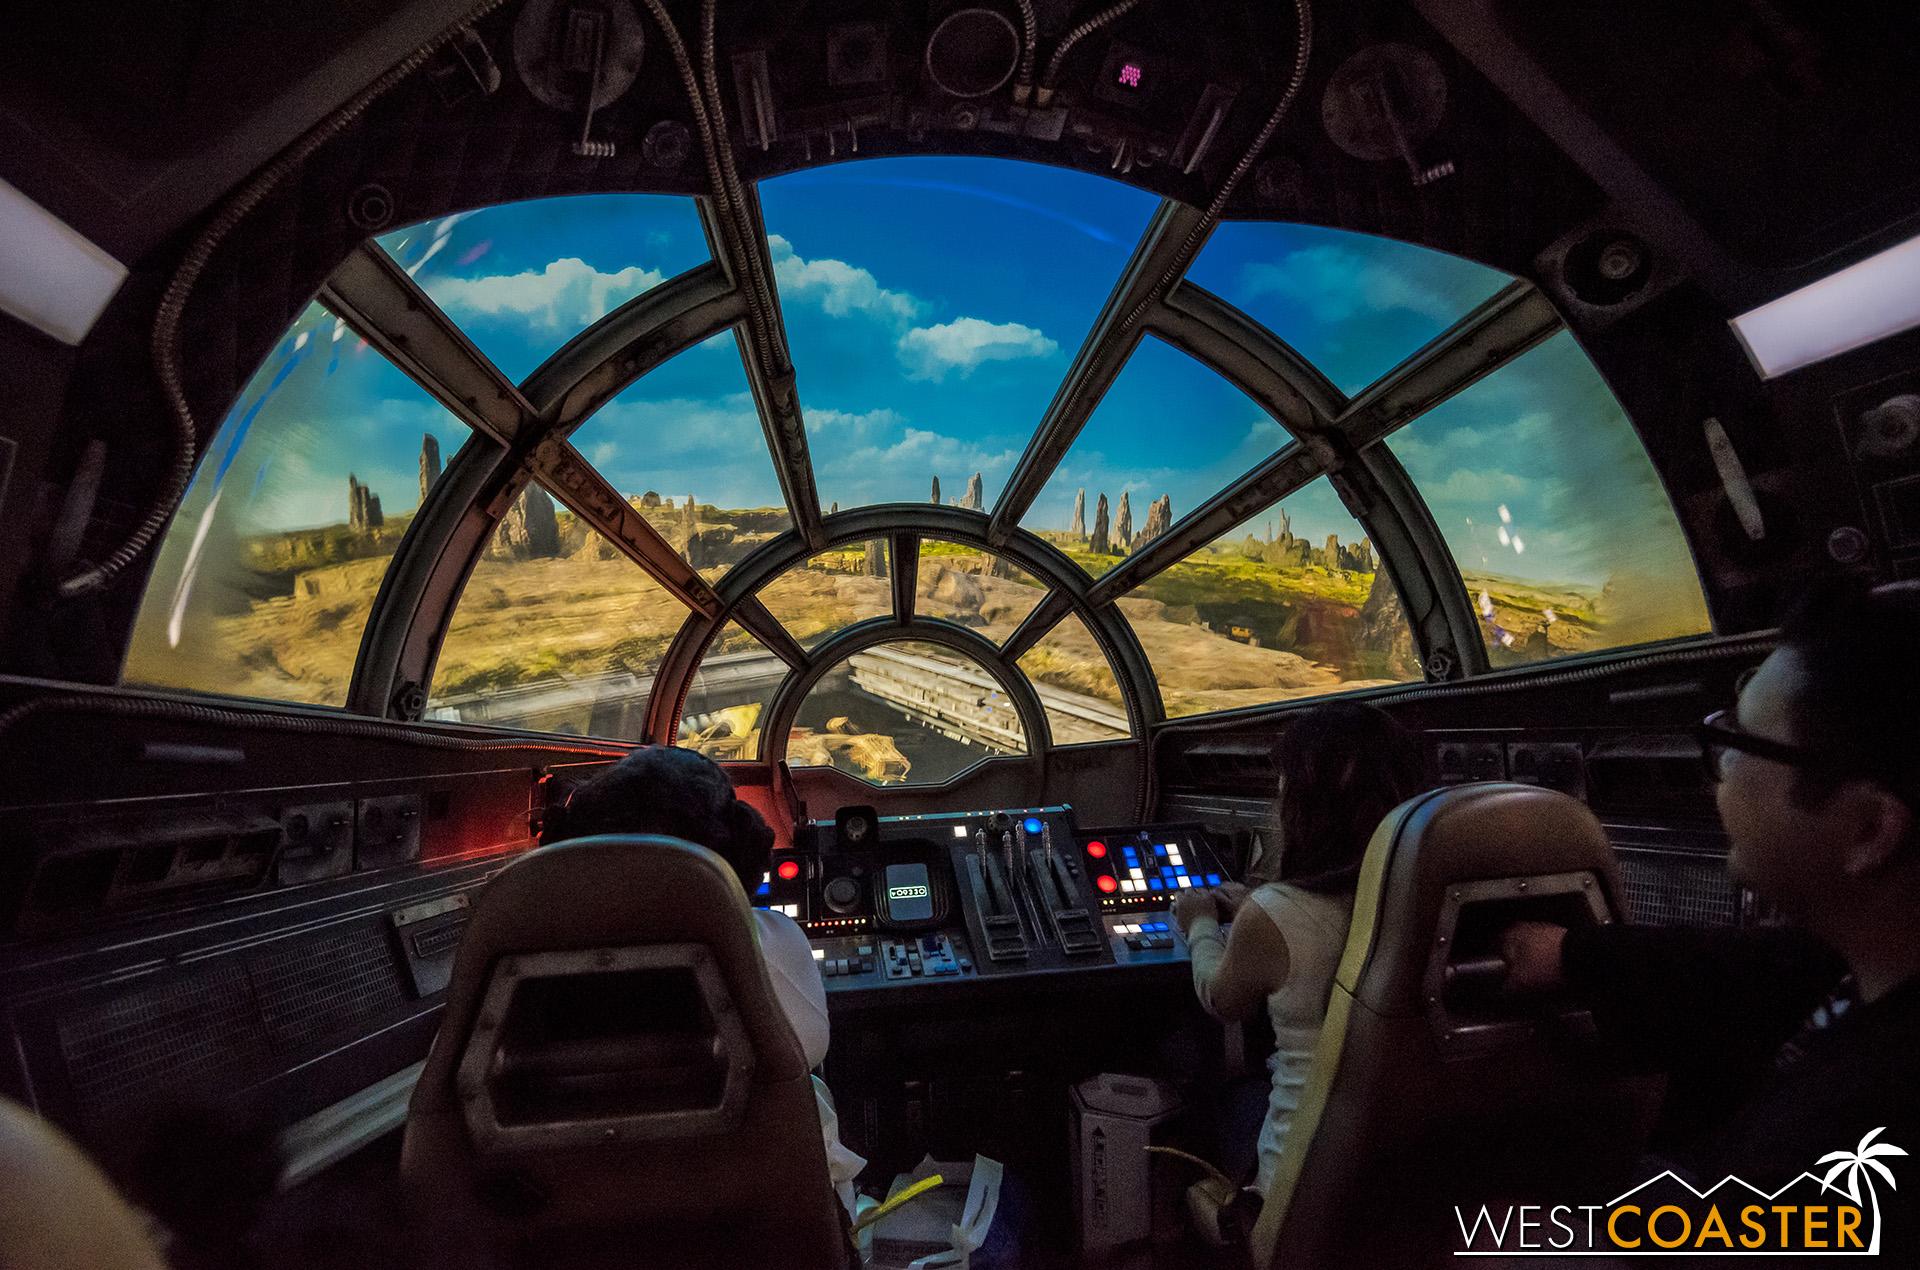 DLR-19_0606-D-Cockpit-0009.jpg